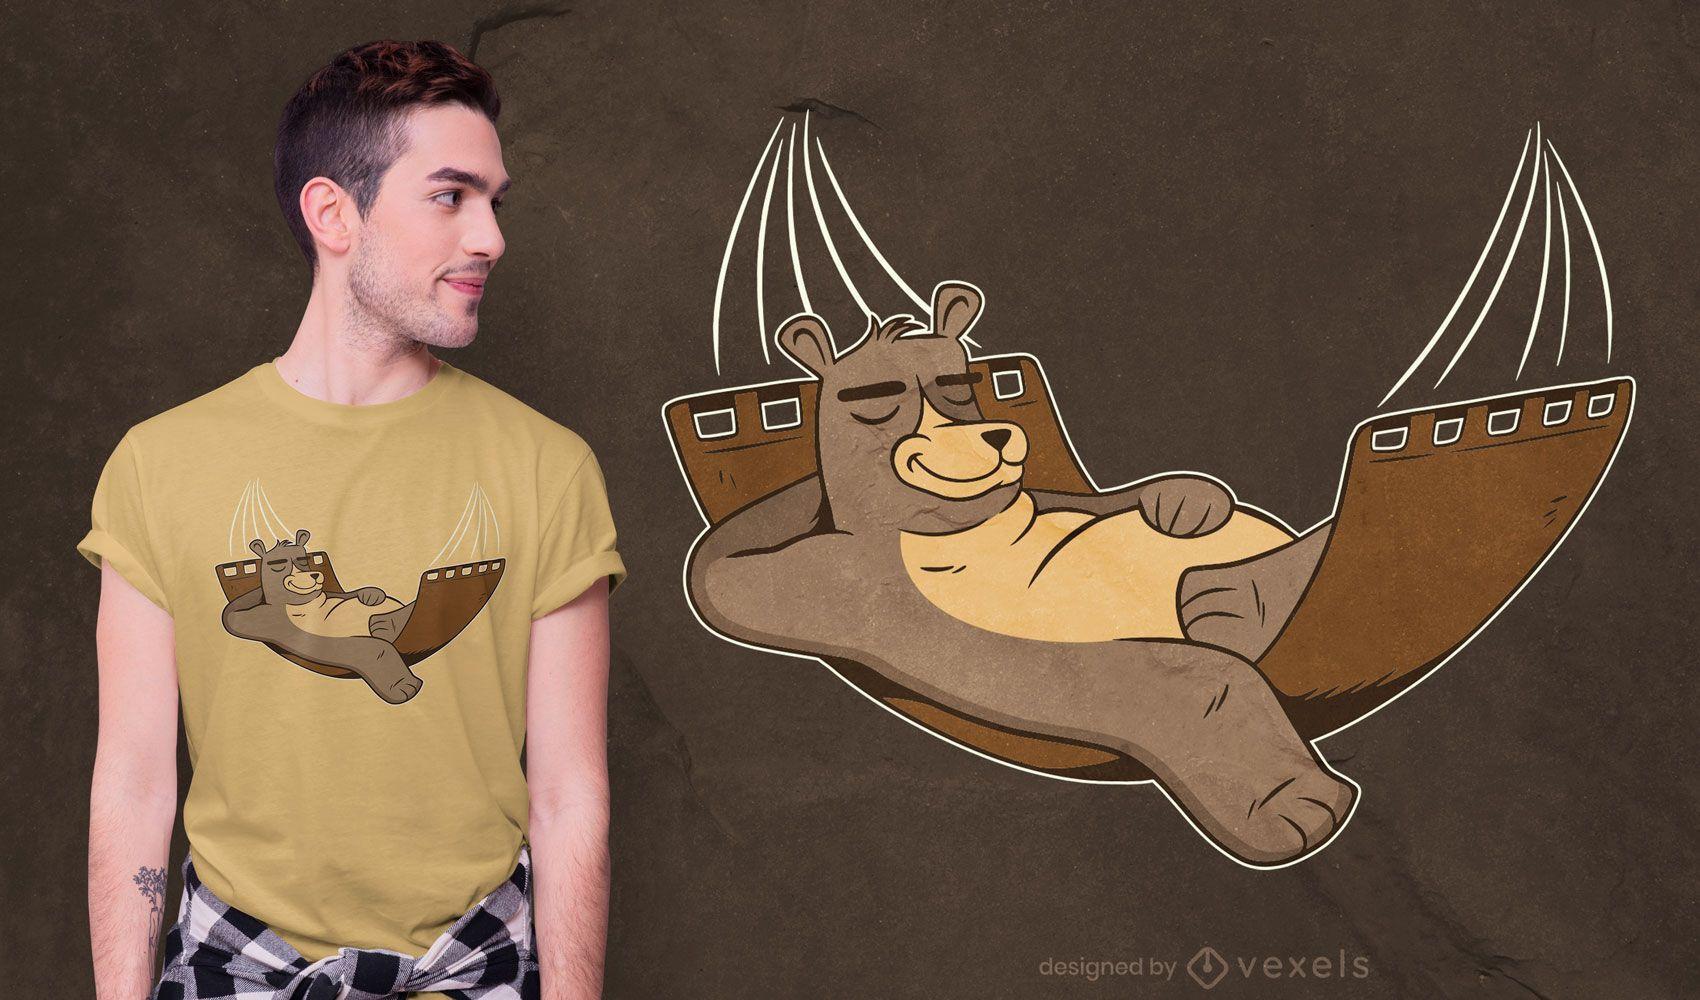 Diseño de camiseta de oso relajado